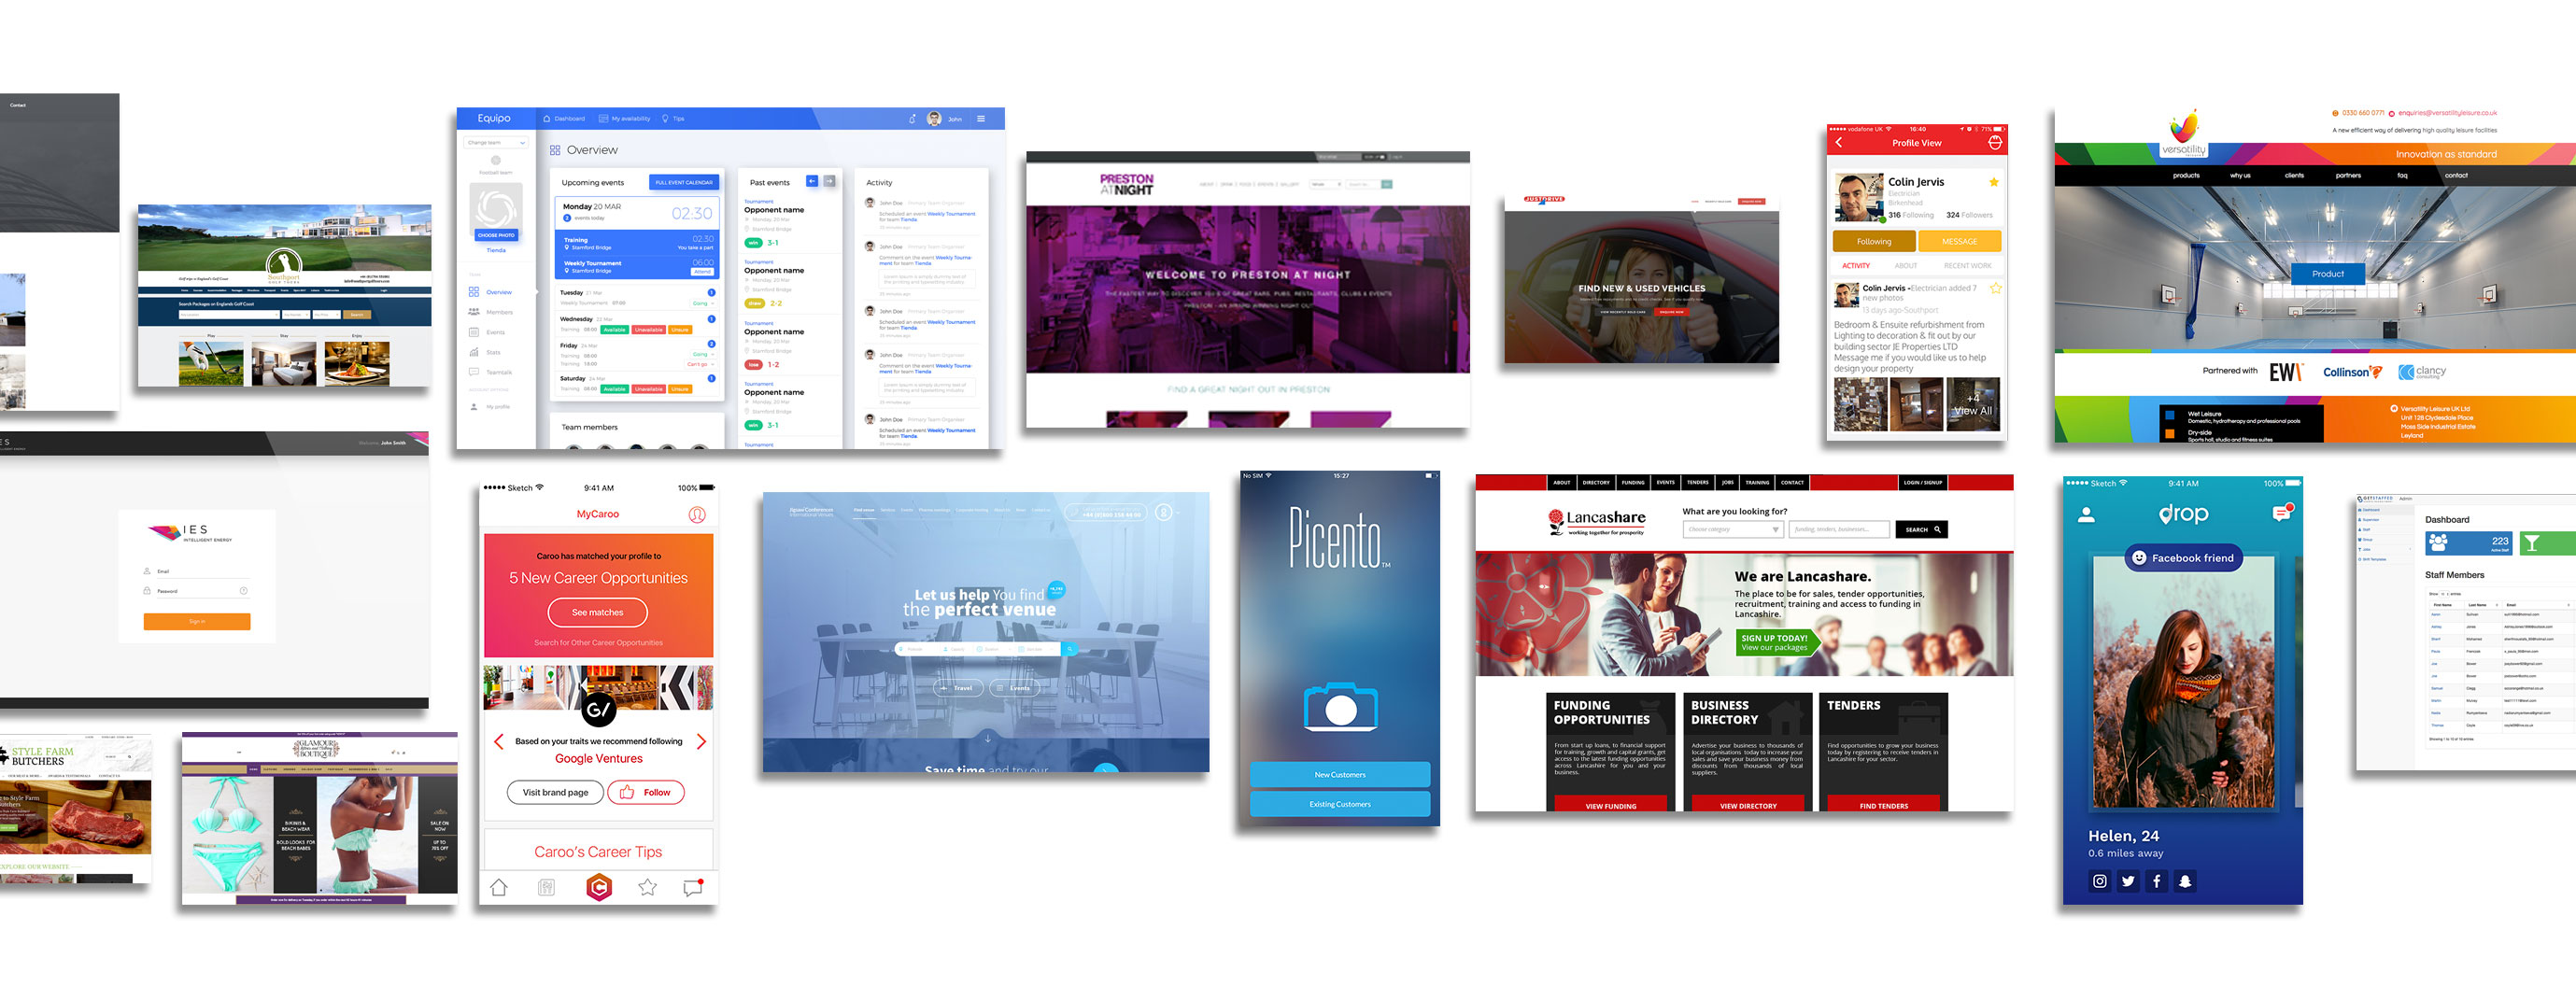 website-la-gi-dizbrand.com